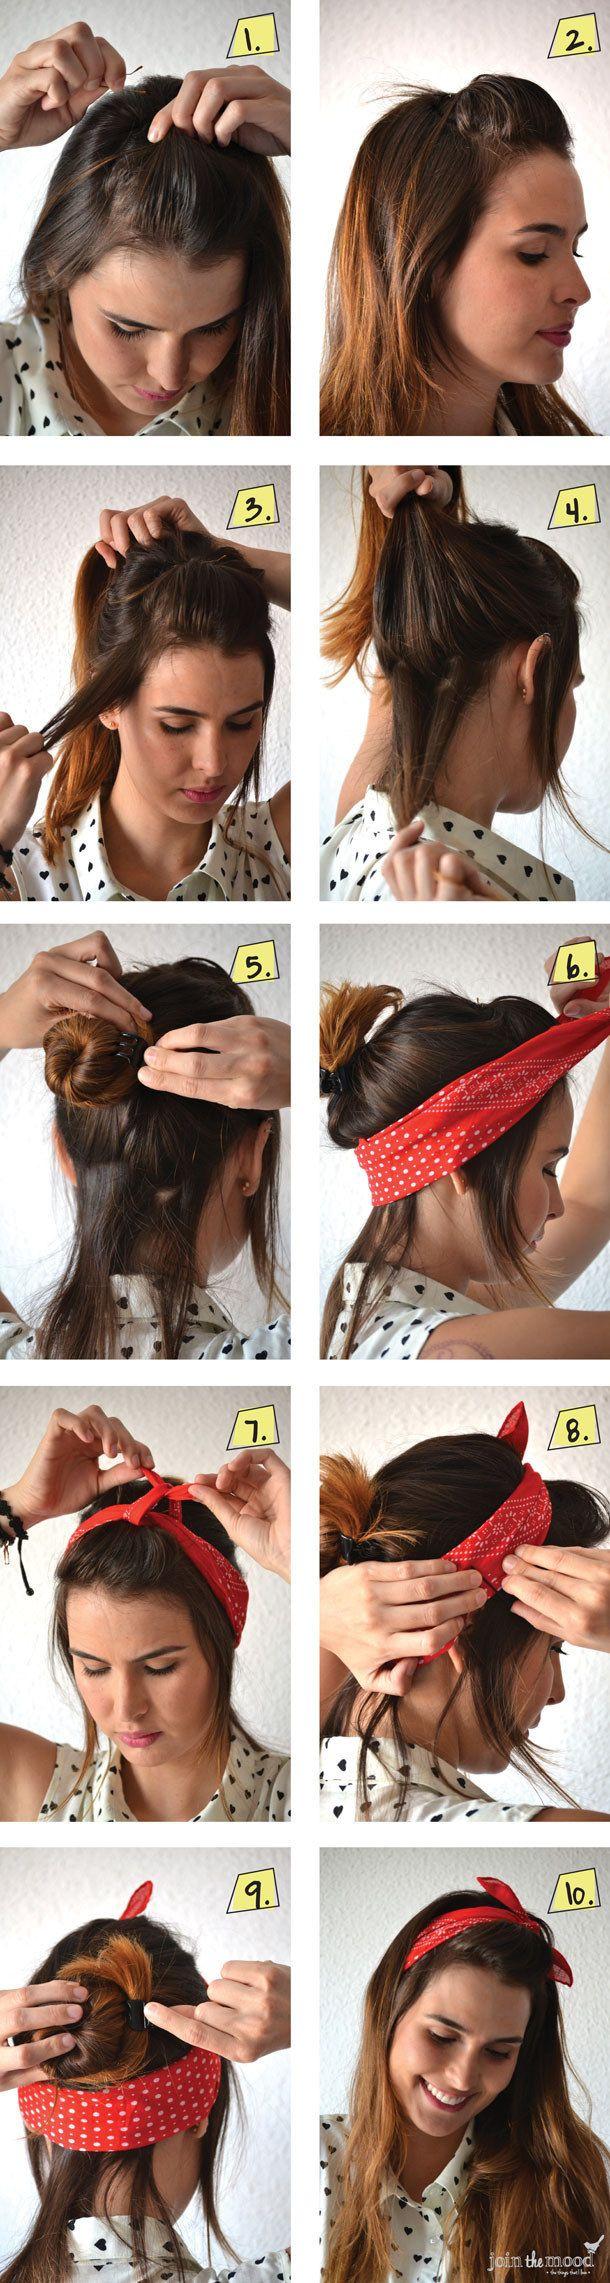 La mejor manera de usar una bandana: